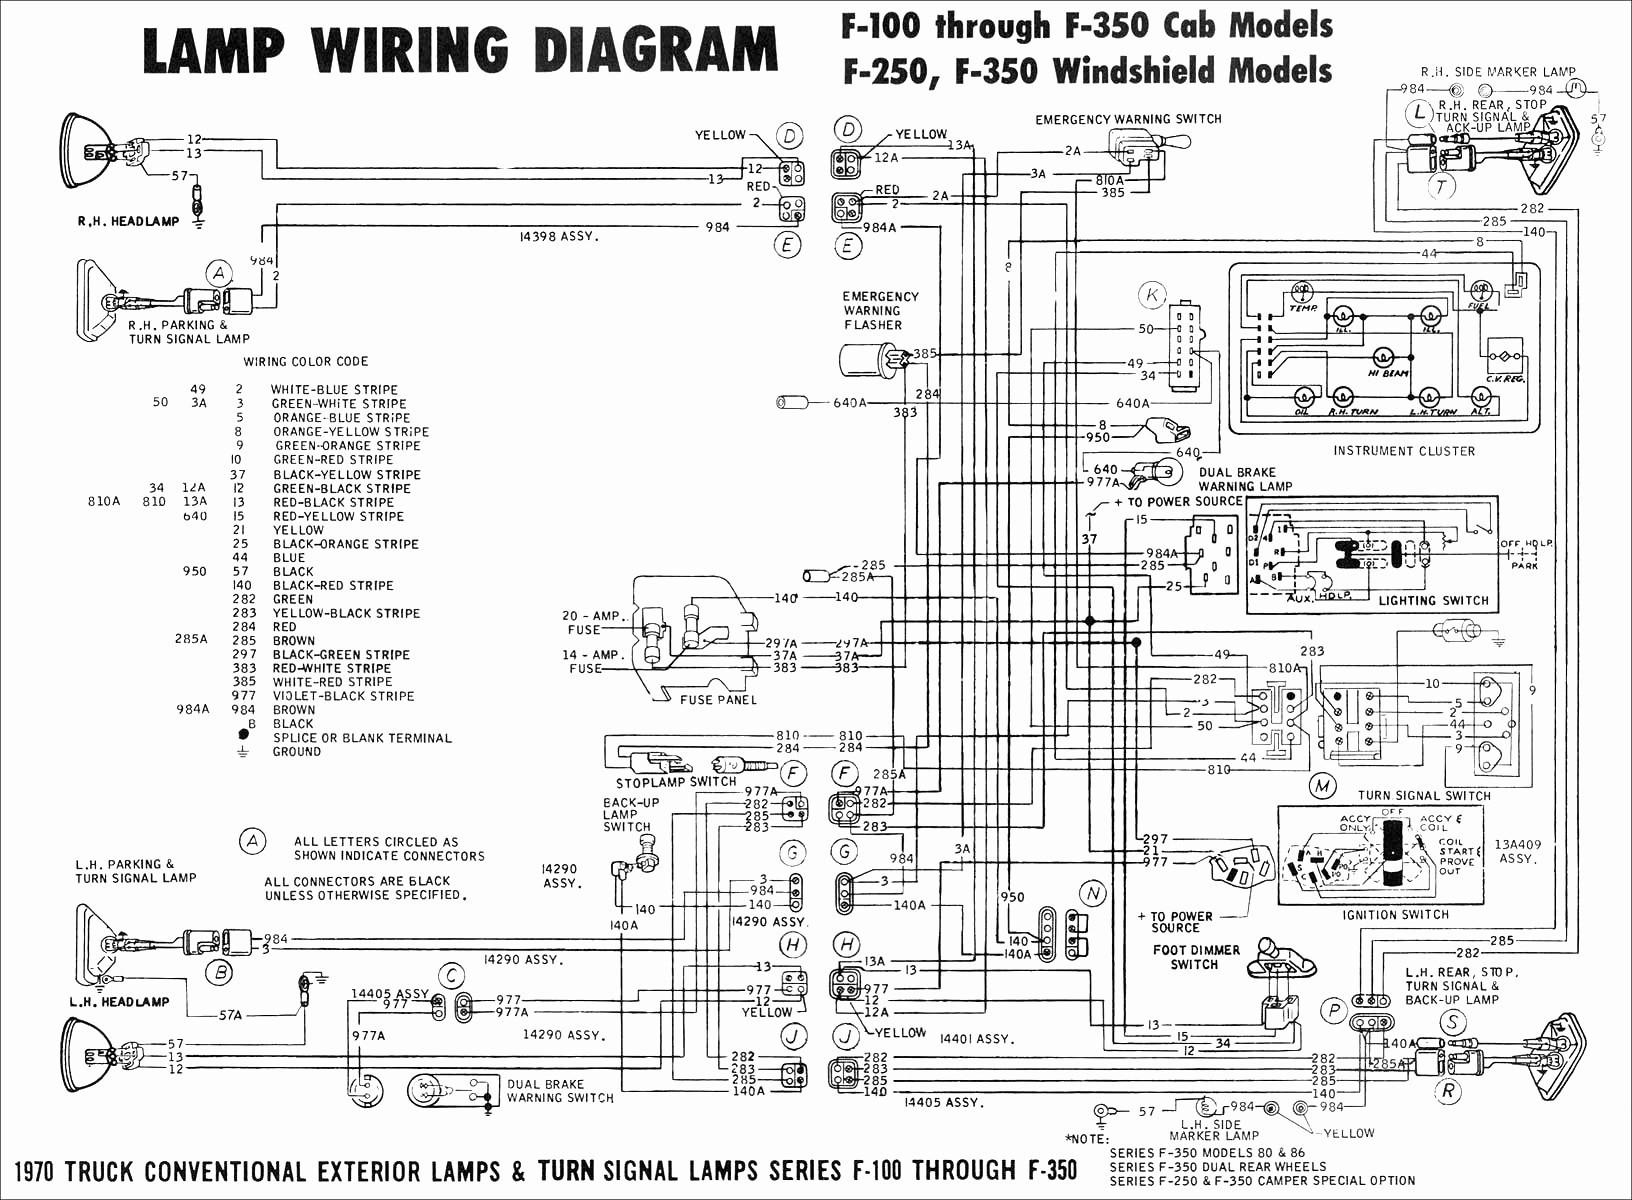 1972 Bronco Alternator Wiring Diagram 74 Bronco Wiring Automatic Of 1972 Bronco Alternator Wiring Diagram